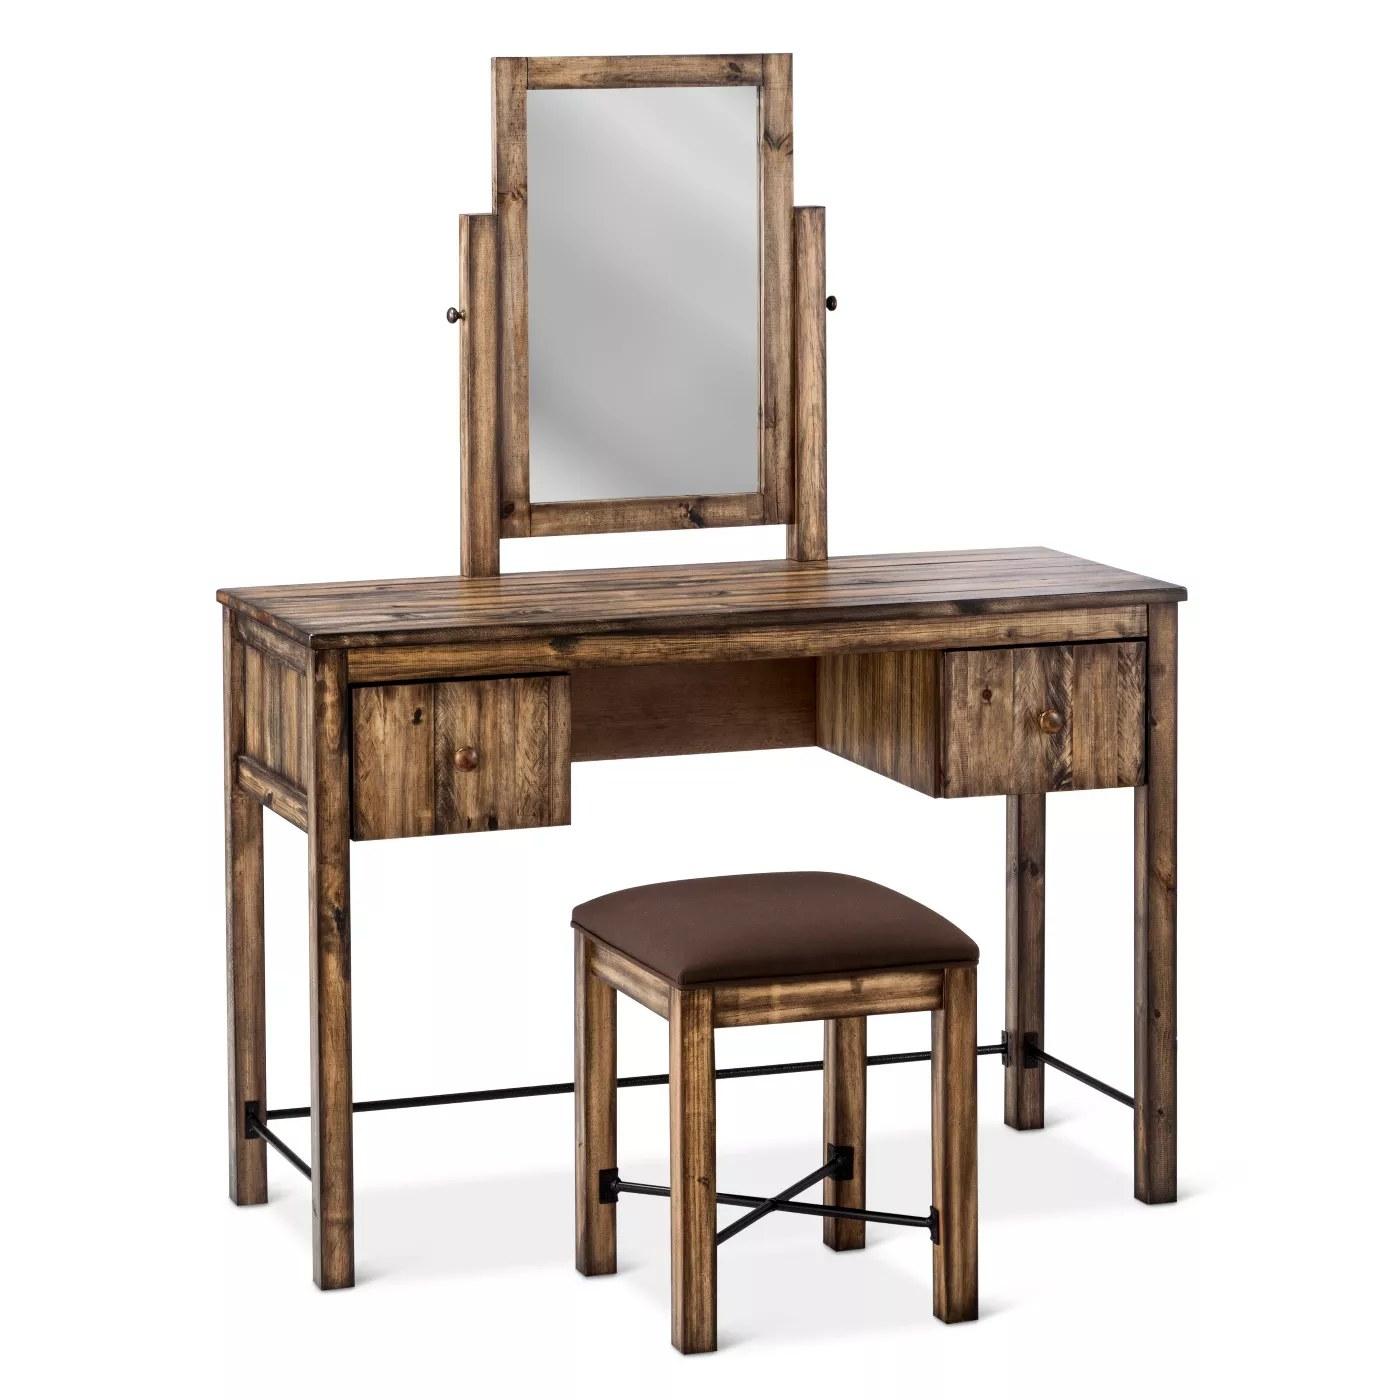 The weathered wooden vanity set